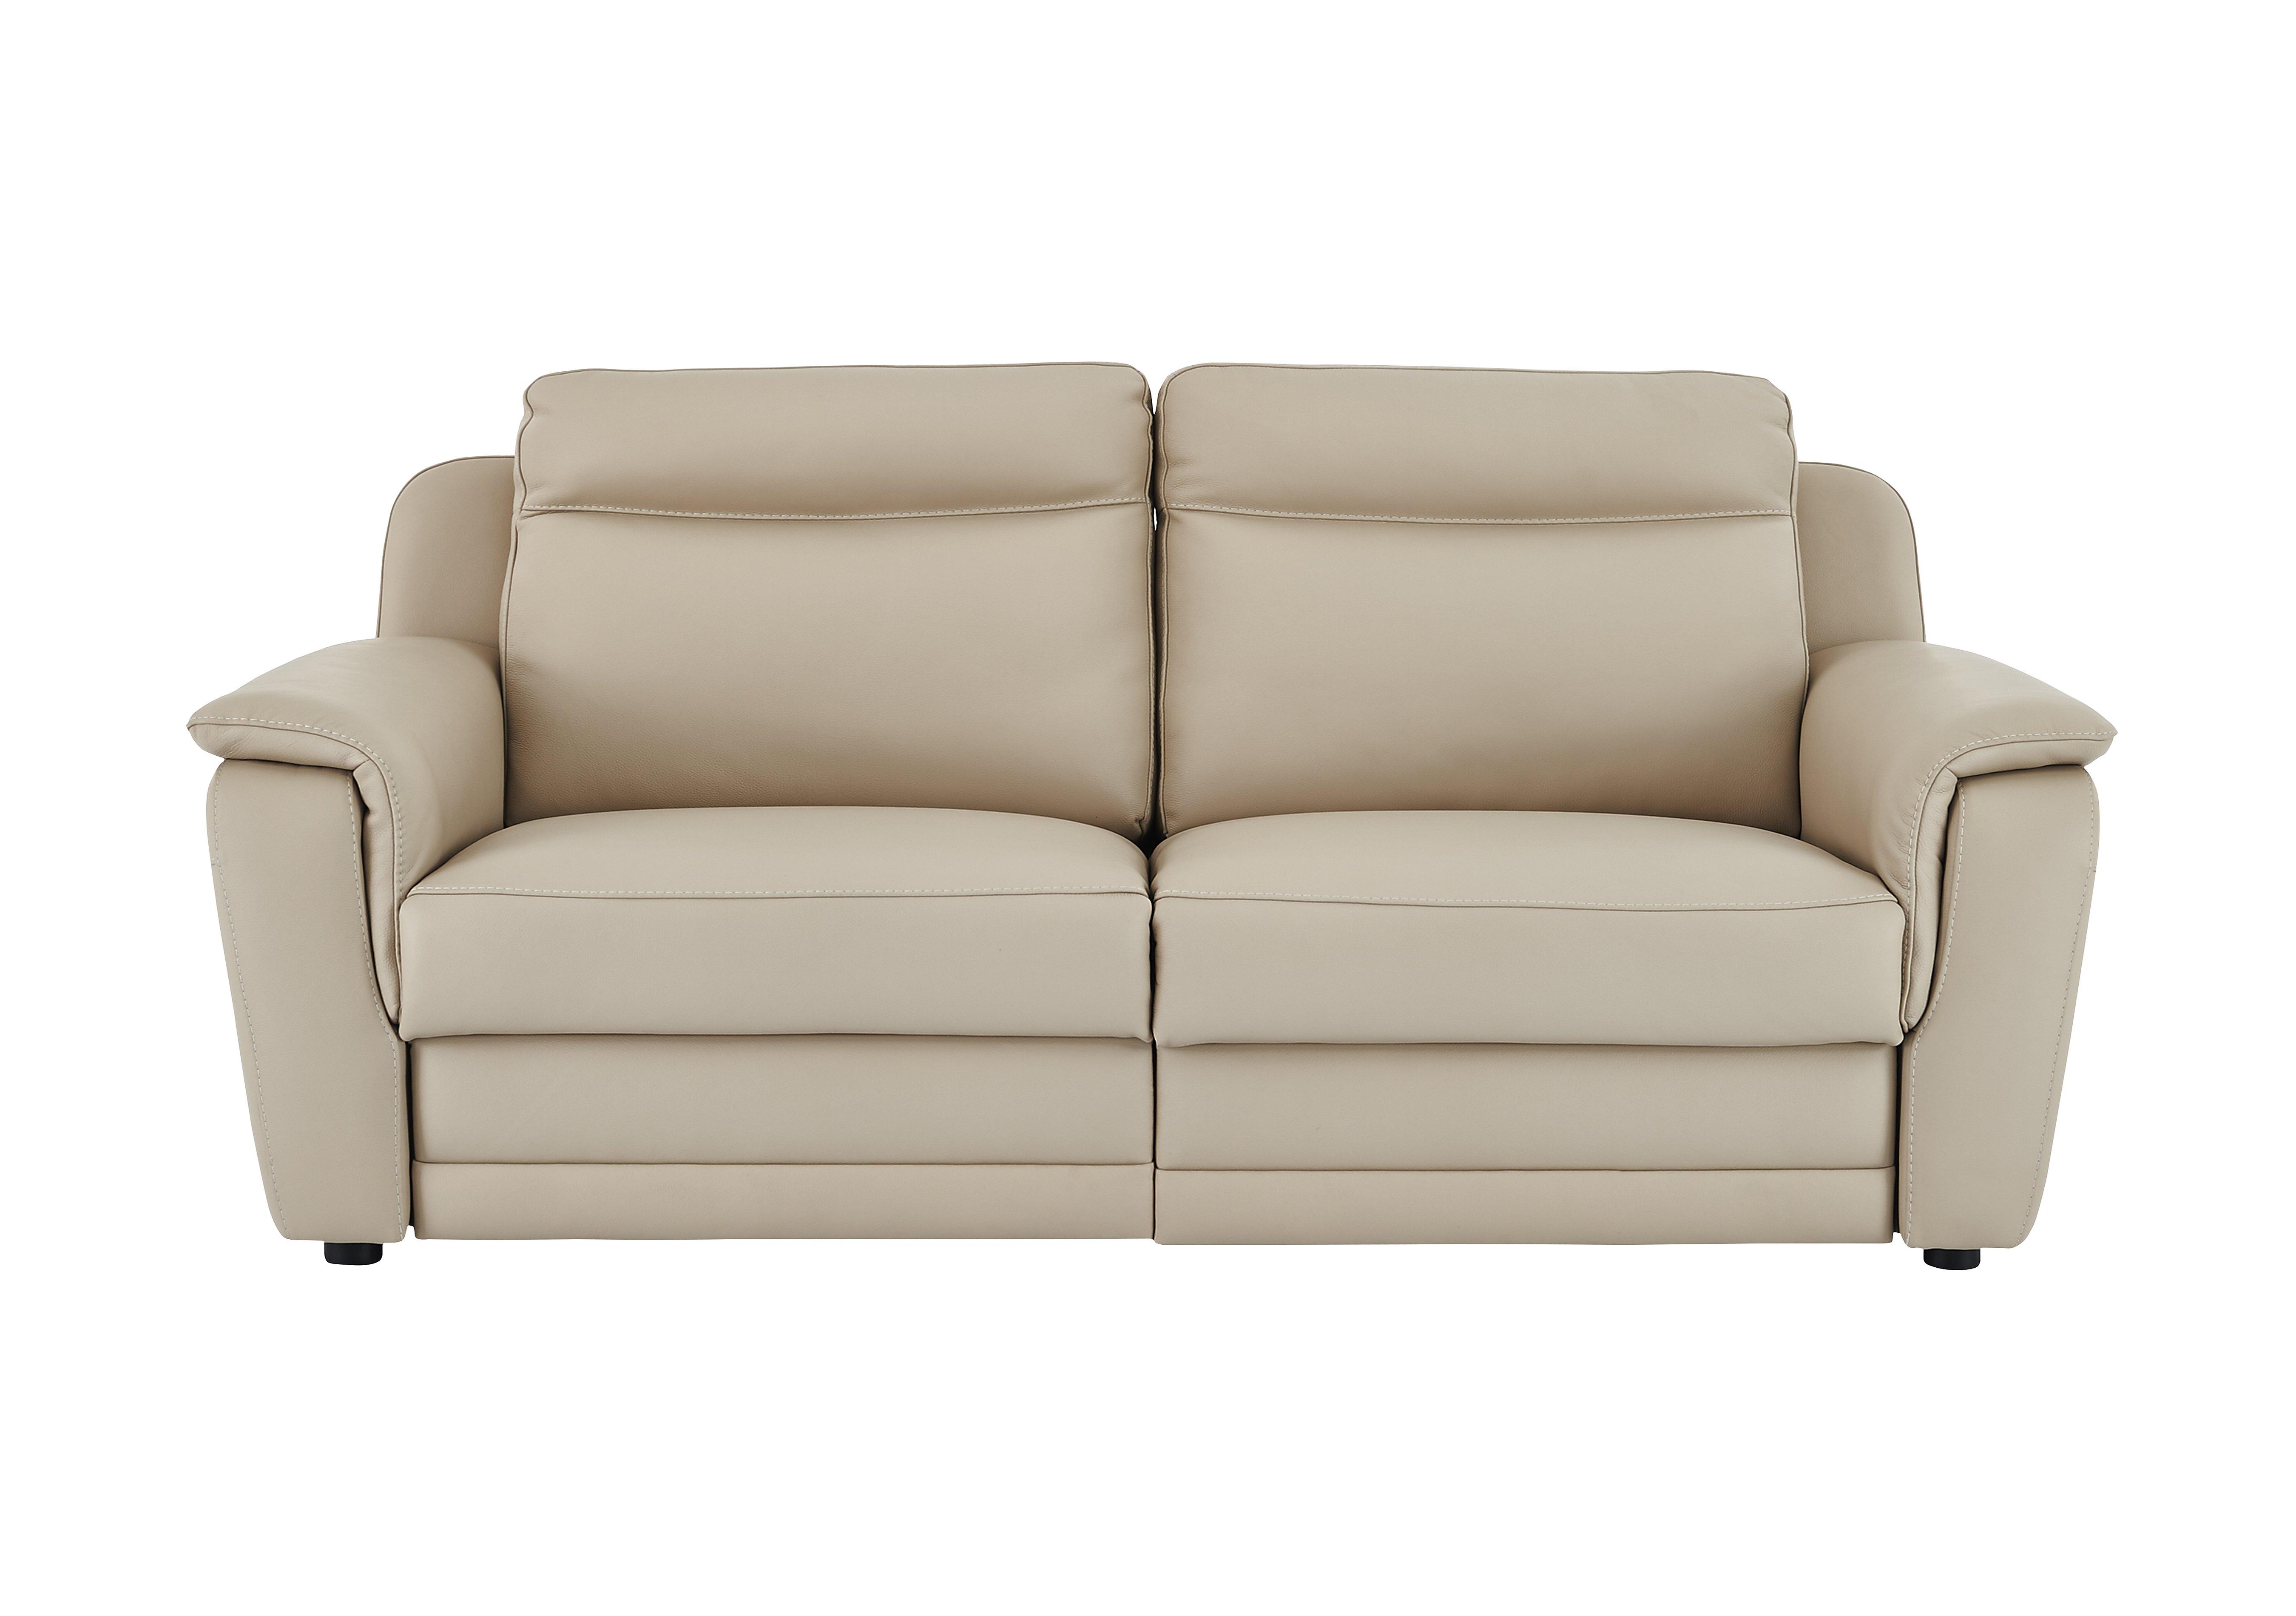 Tara 3 Seater Leather Recliner Sofa Nicoletti Furniture Village